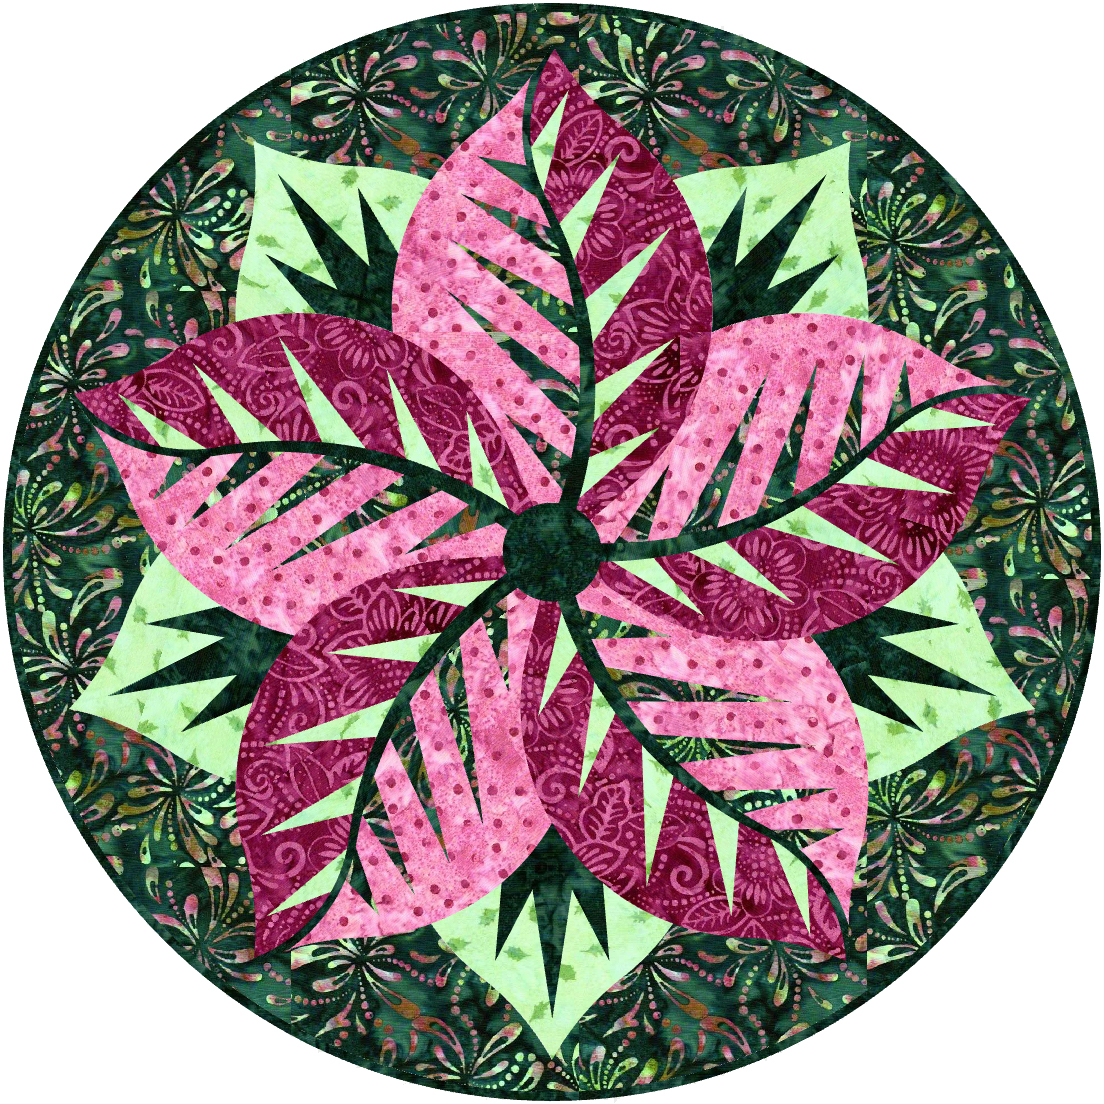 Poinsettia-Watermelon